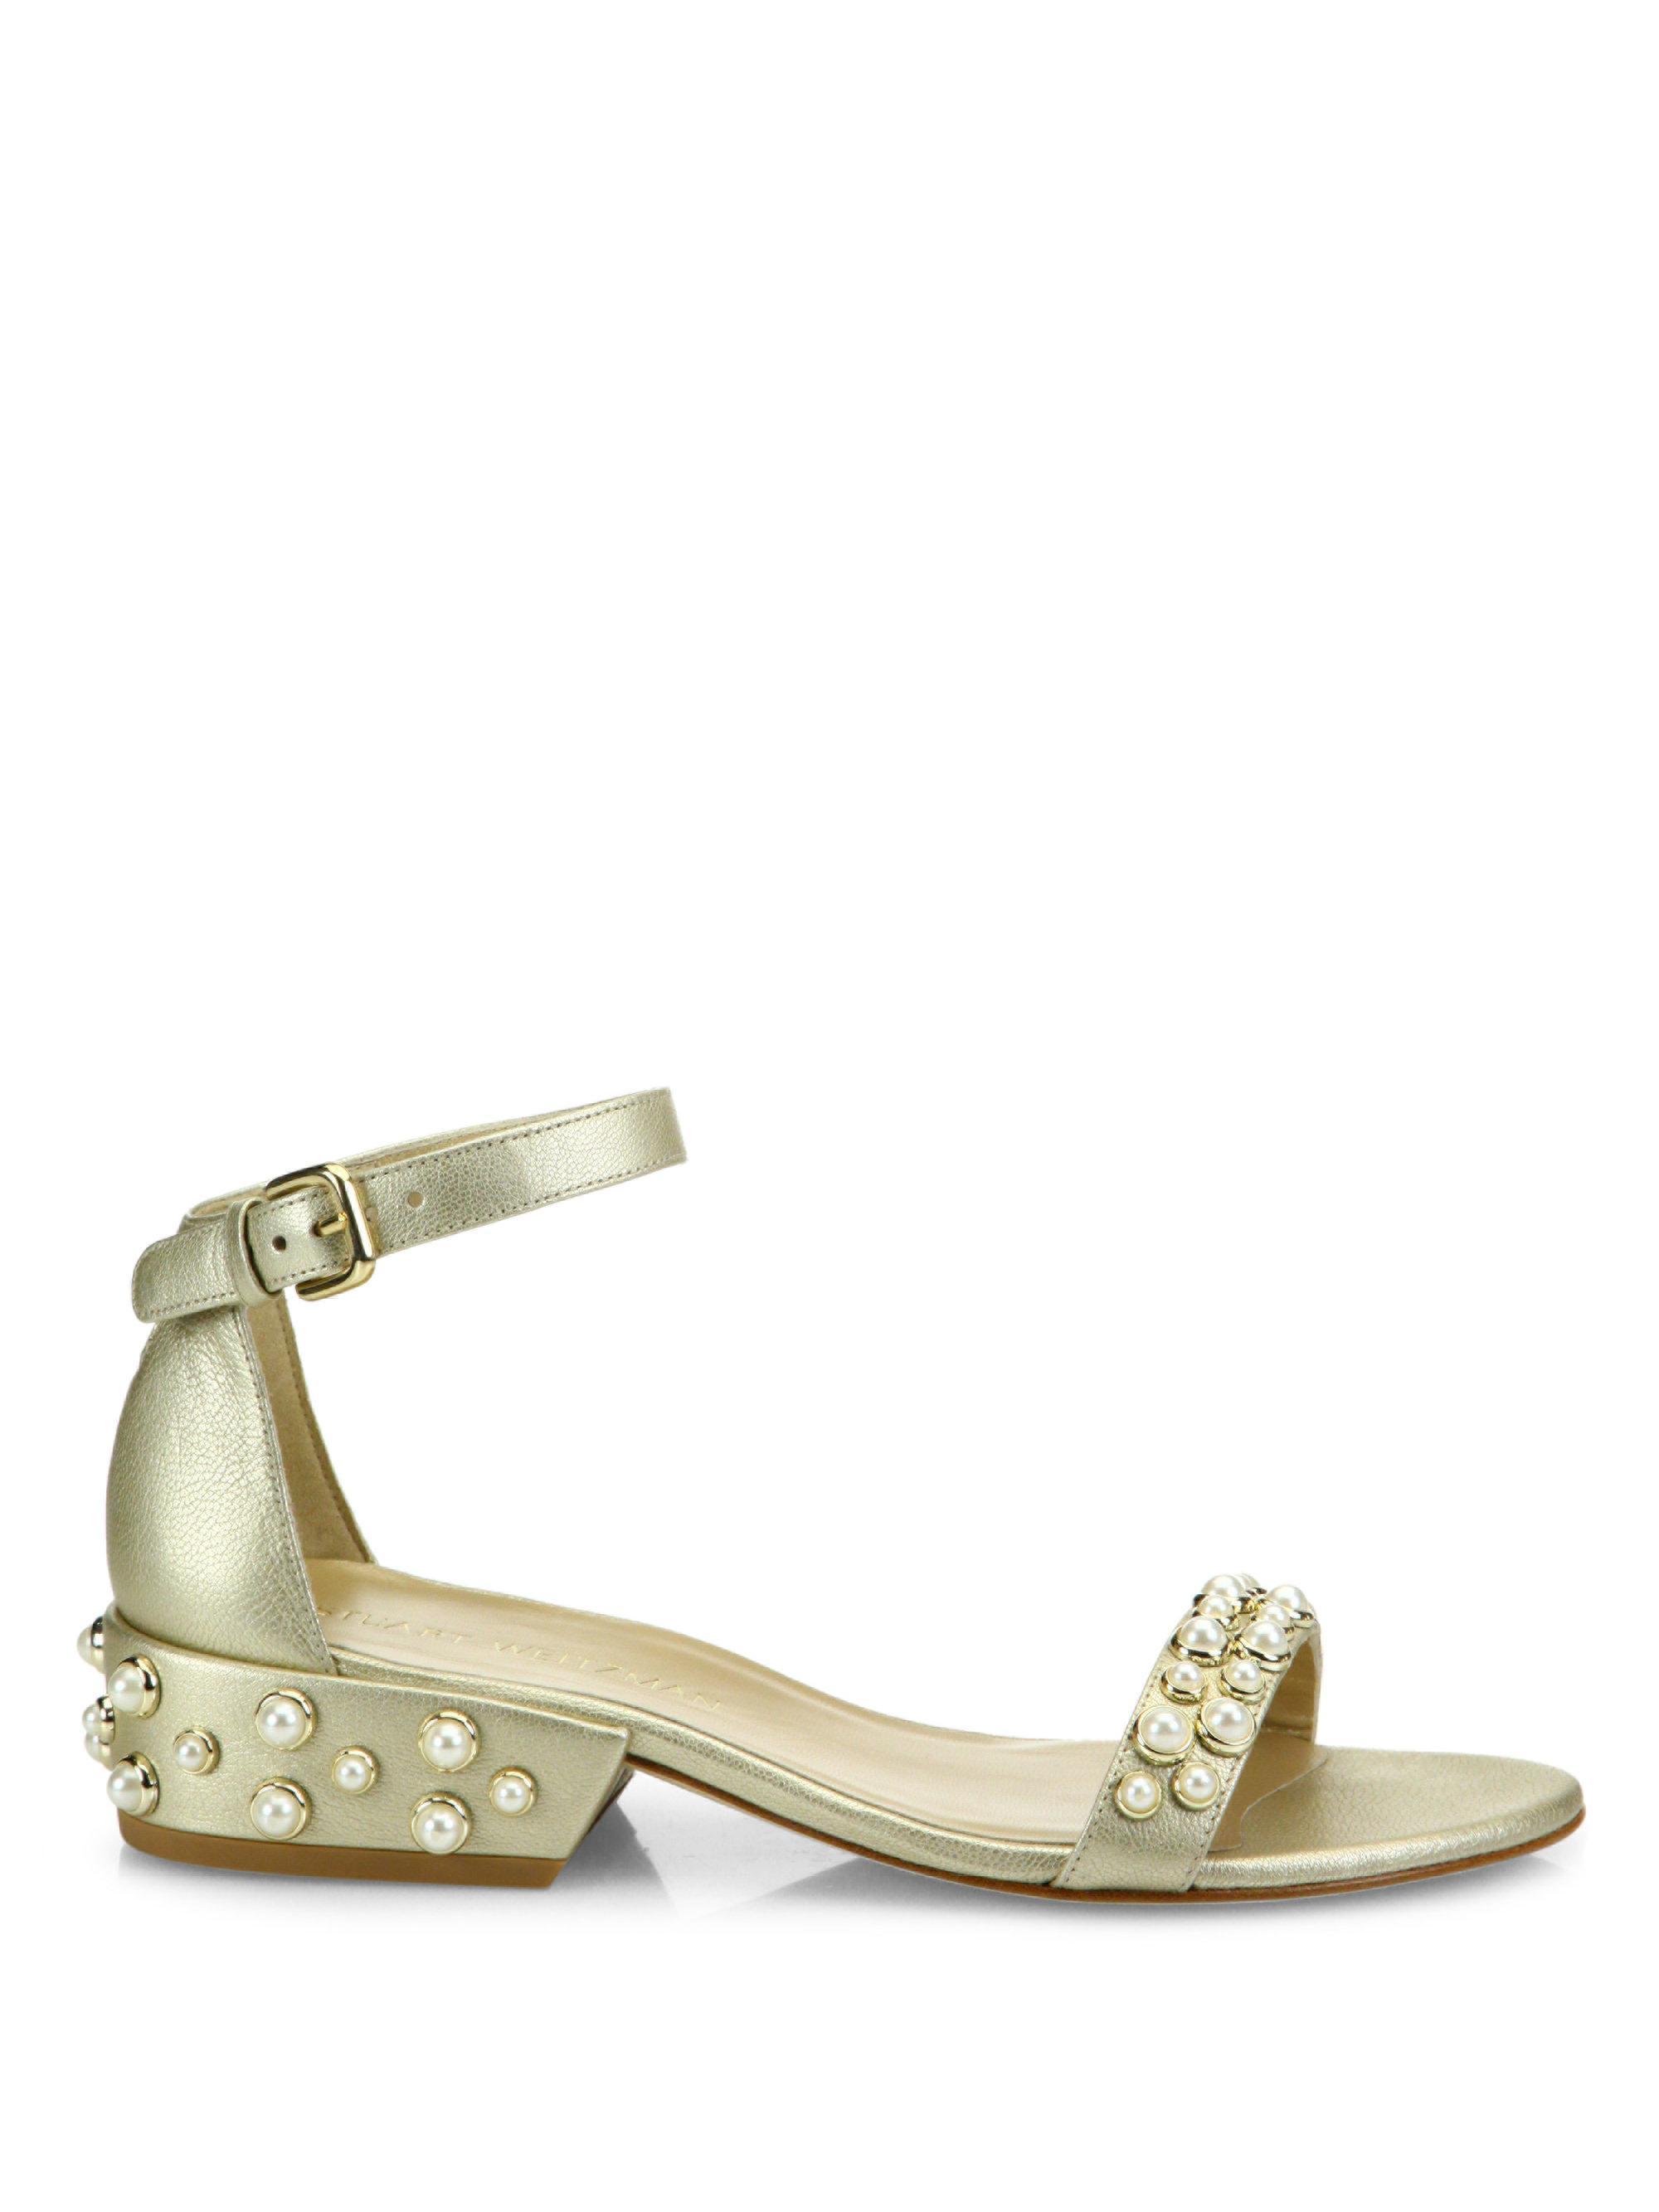 classic for sale Stuart Weitzman All Pearl Metallic Sandals big sale sale online Jkbe9ayN8S